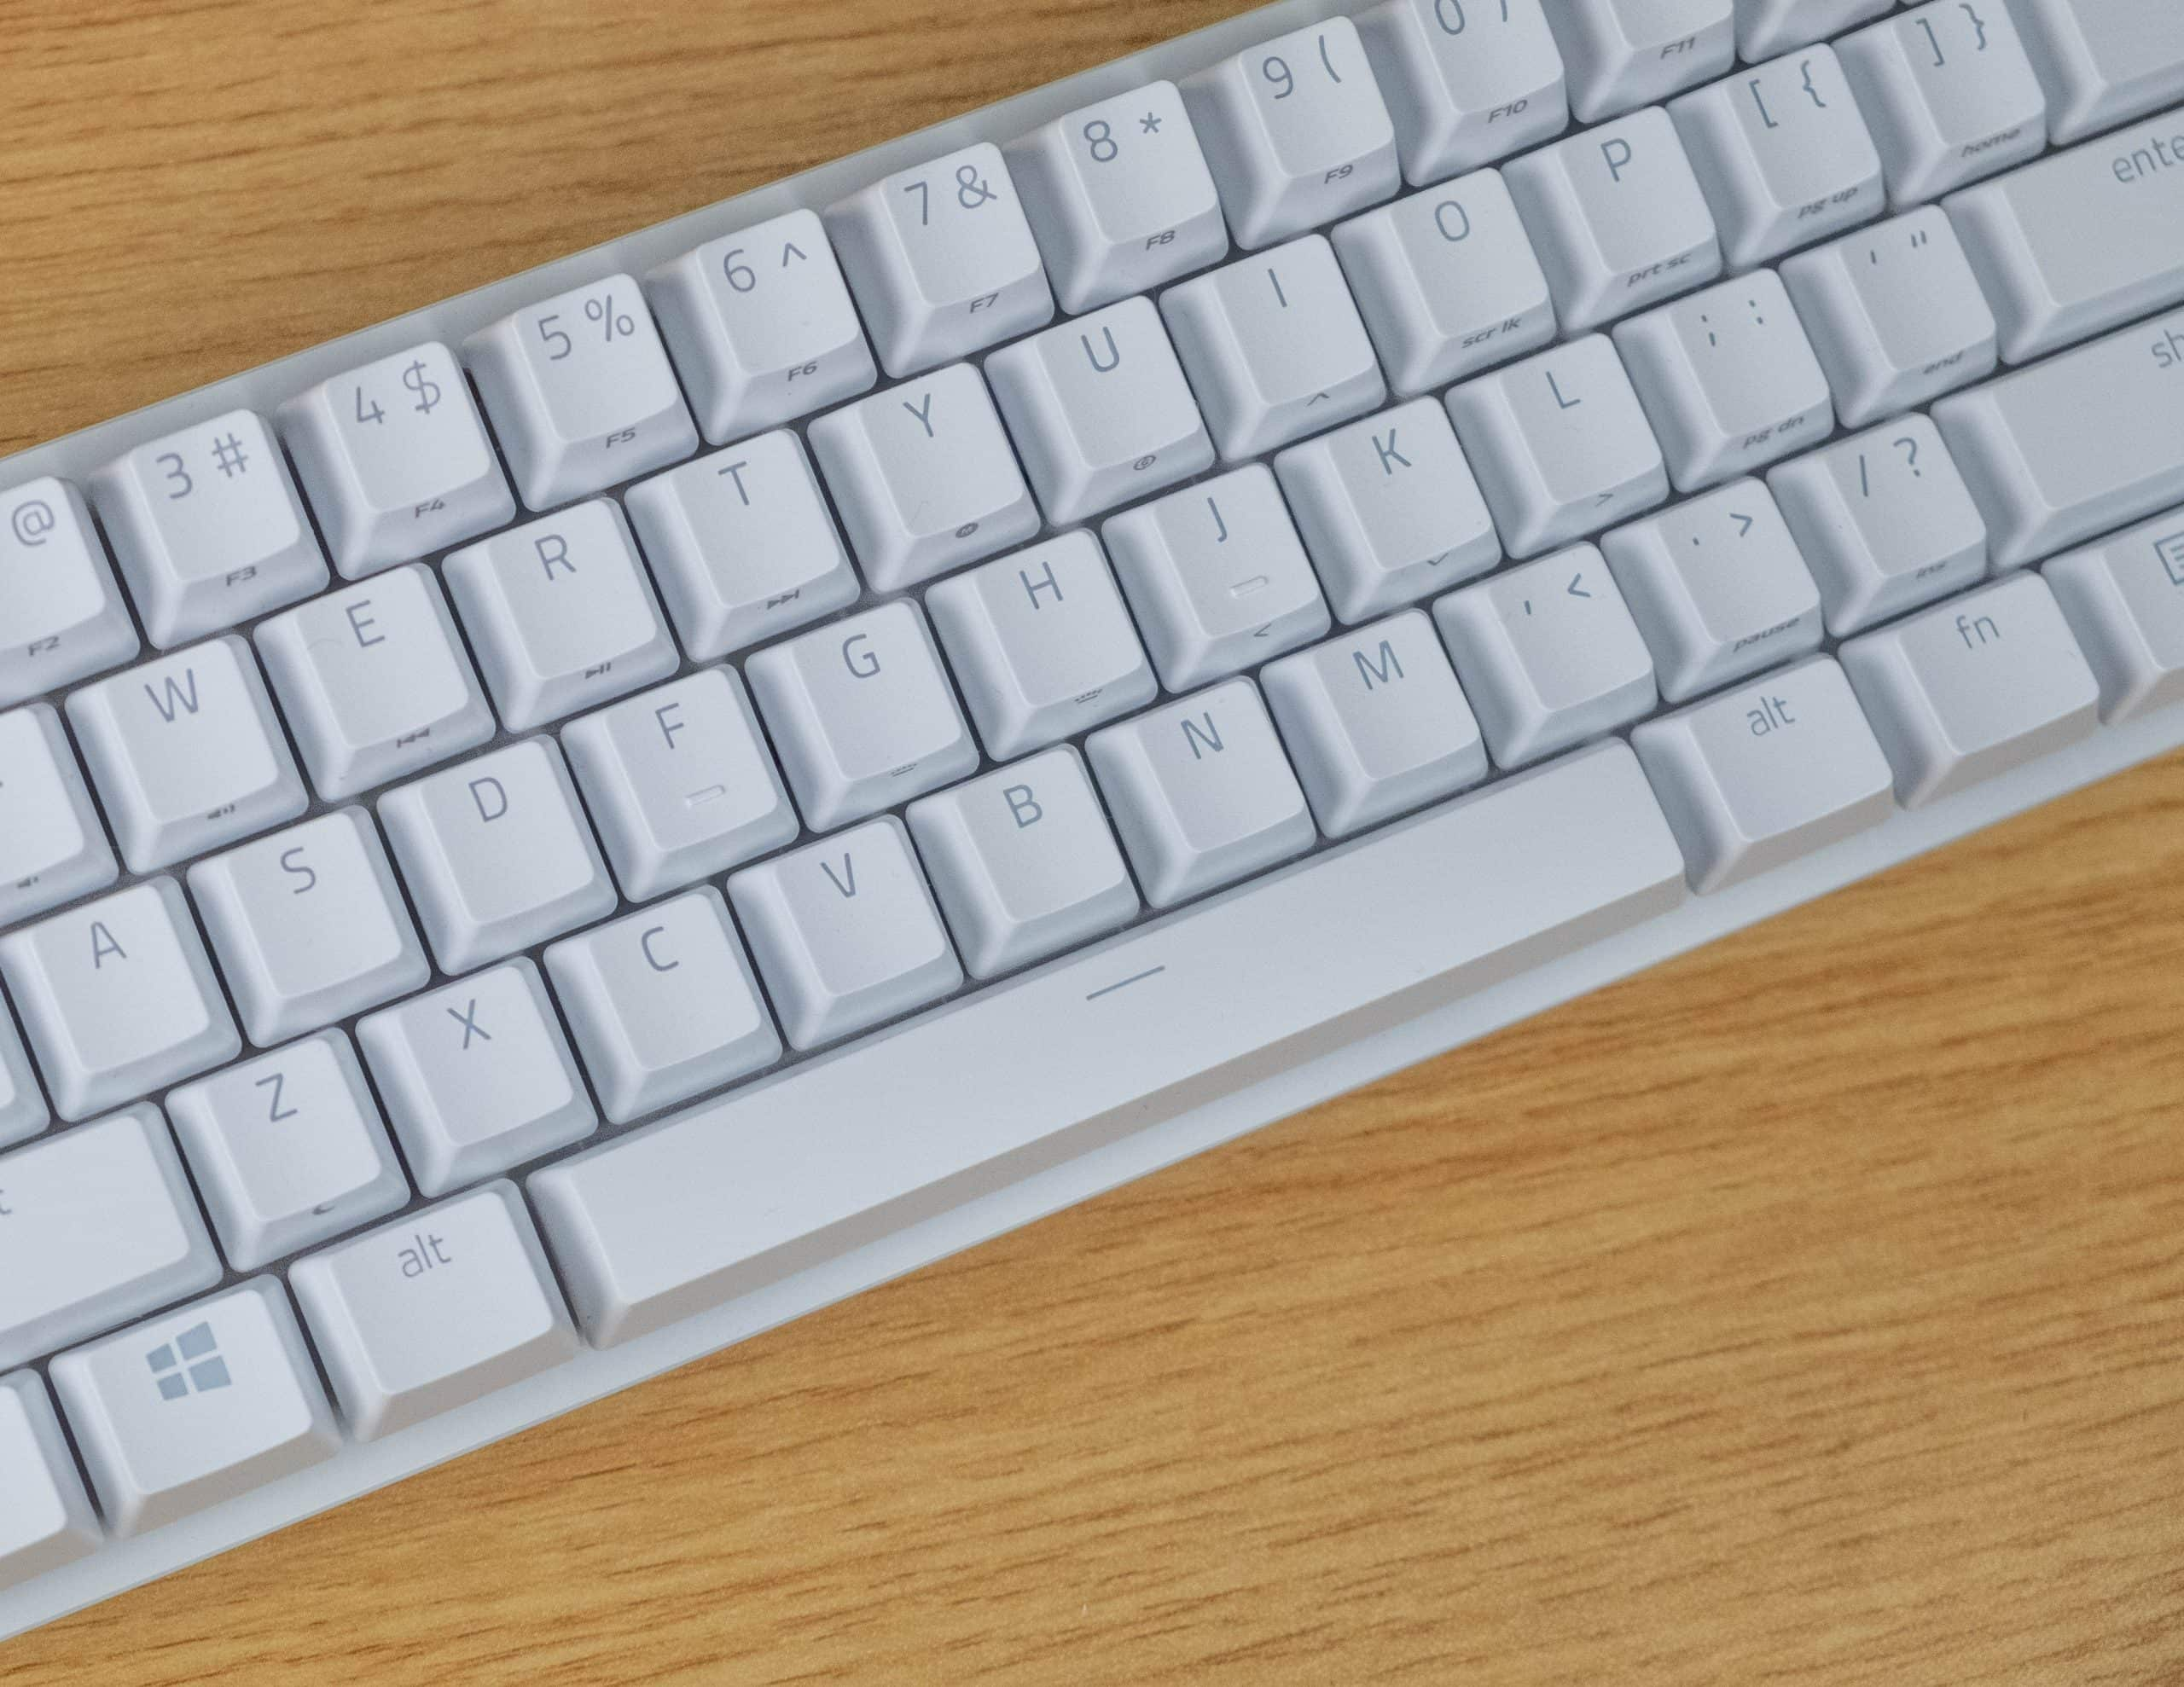 Razer Huntsman Mini - Keycap design